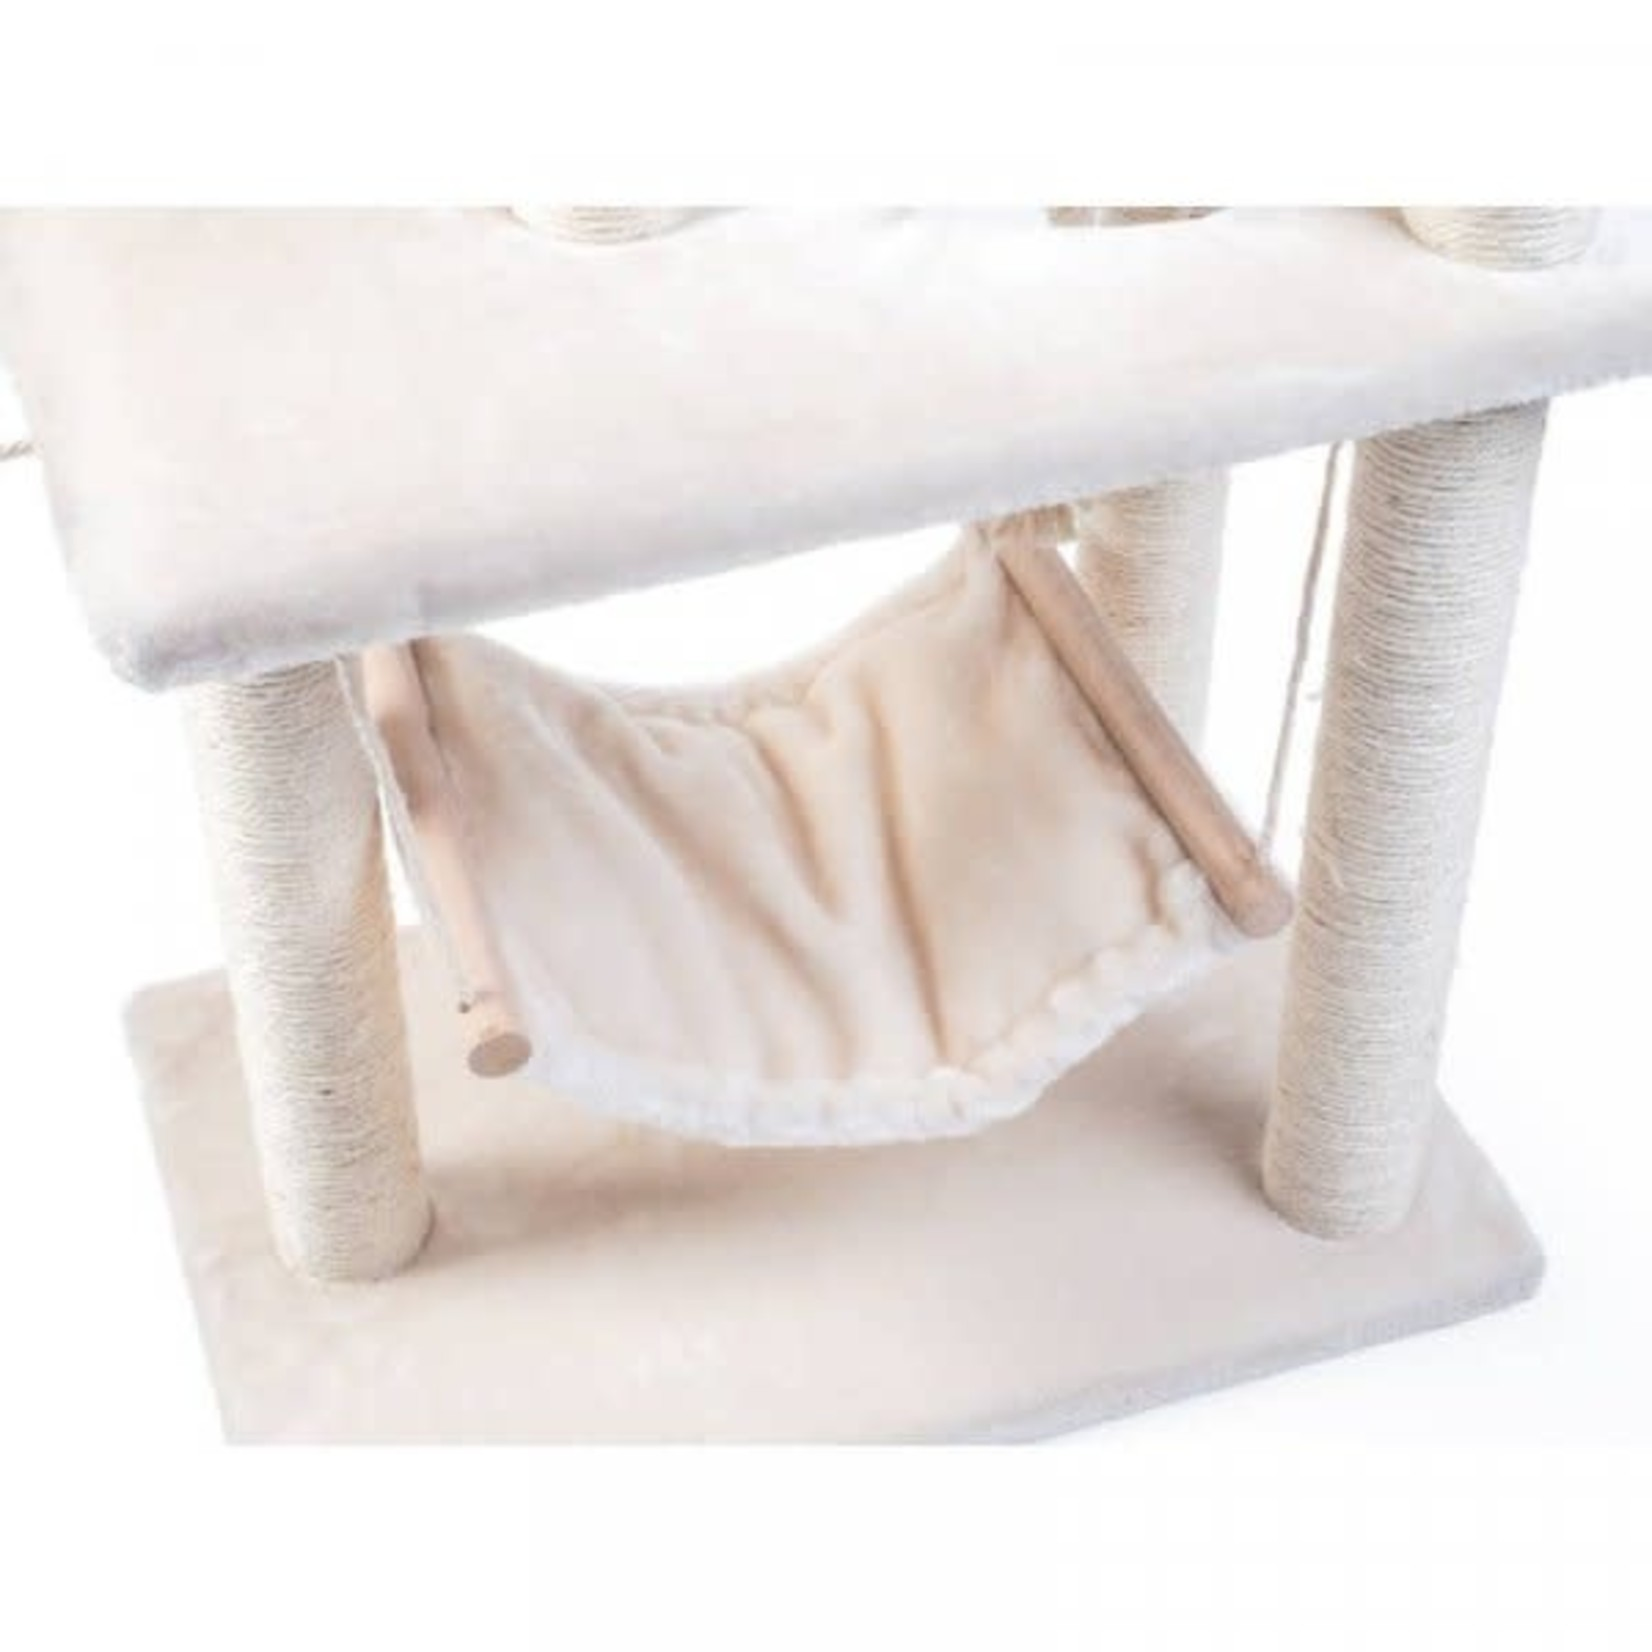 Zöon Deluxe Hammock CatZone Cat Scratching Post, 1.2m